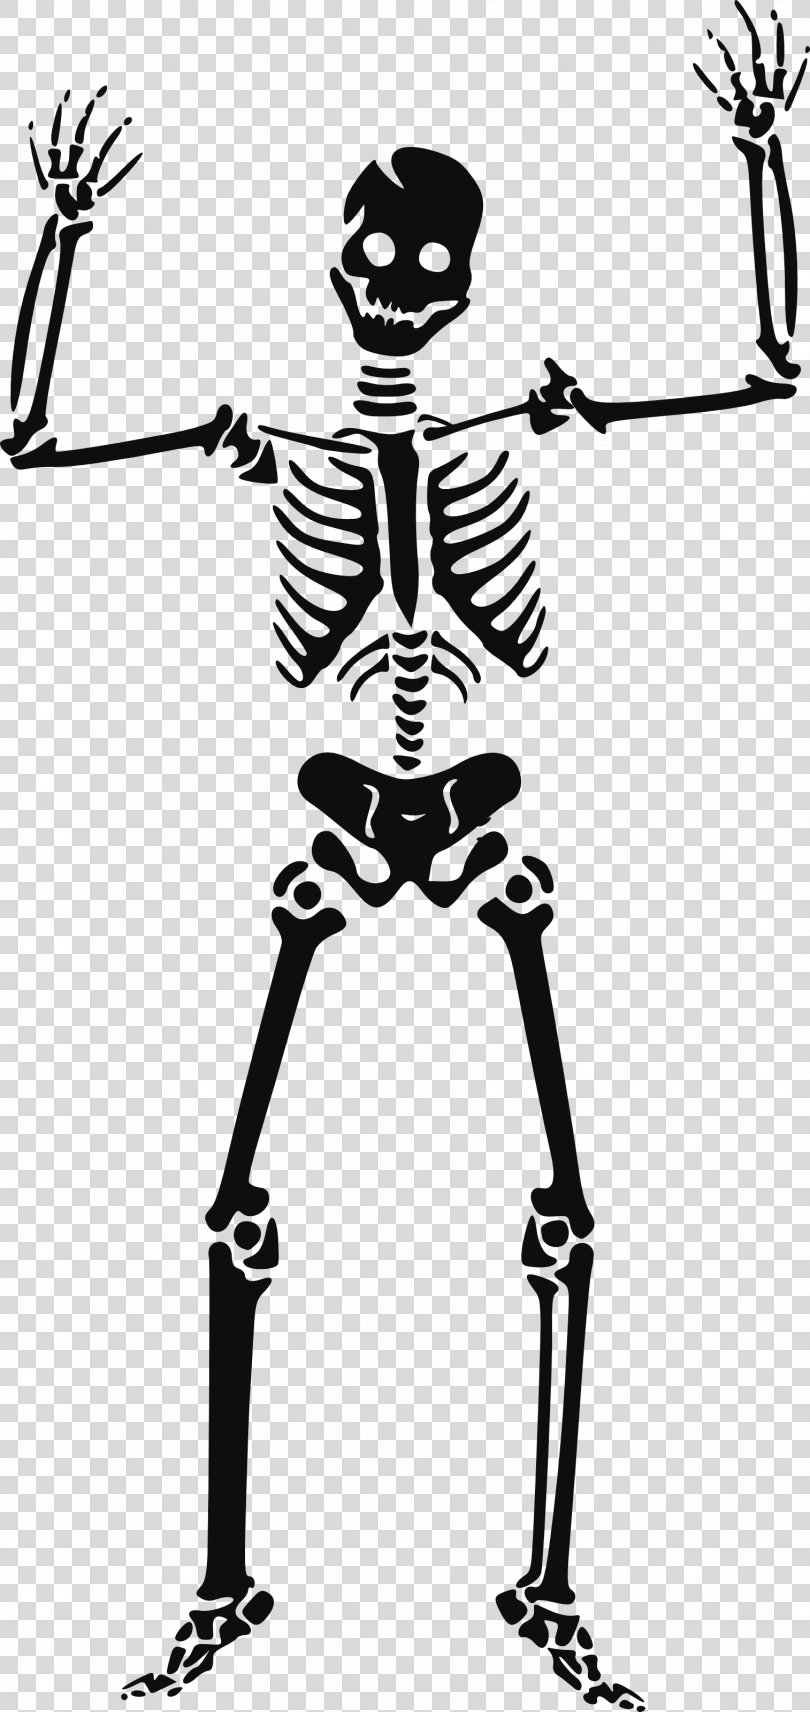 Human Skeleton Clip Art, Skeleton Siluet Image PNG